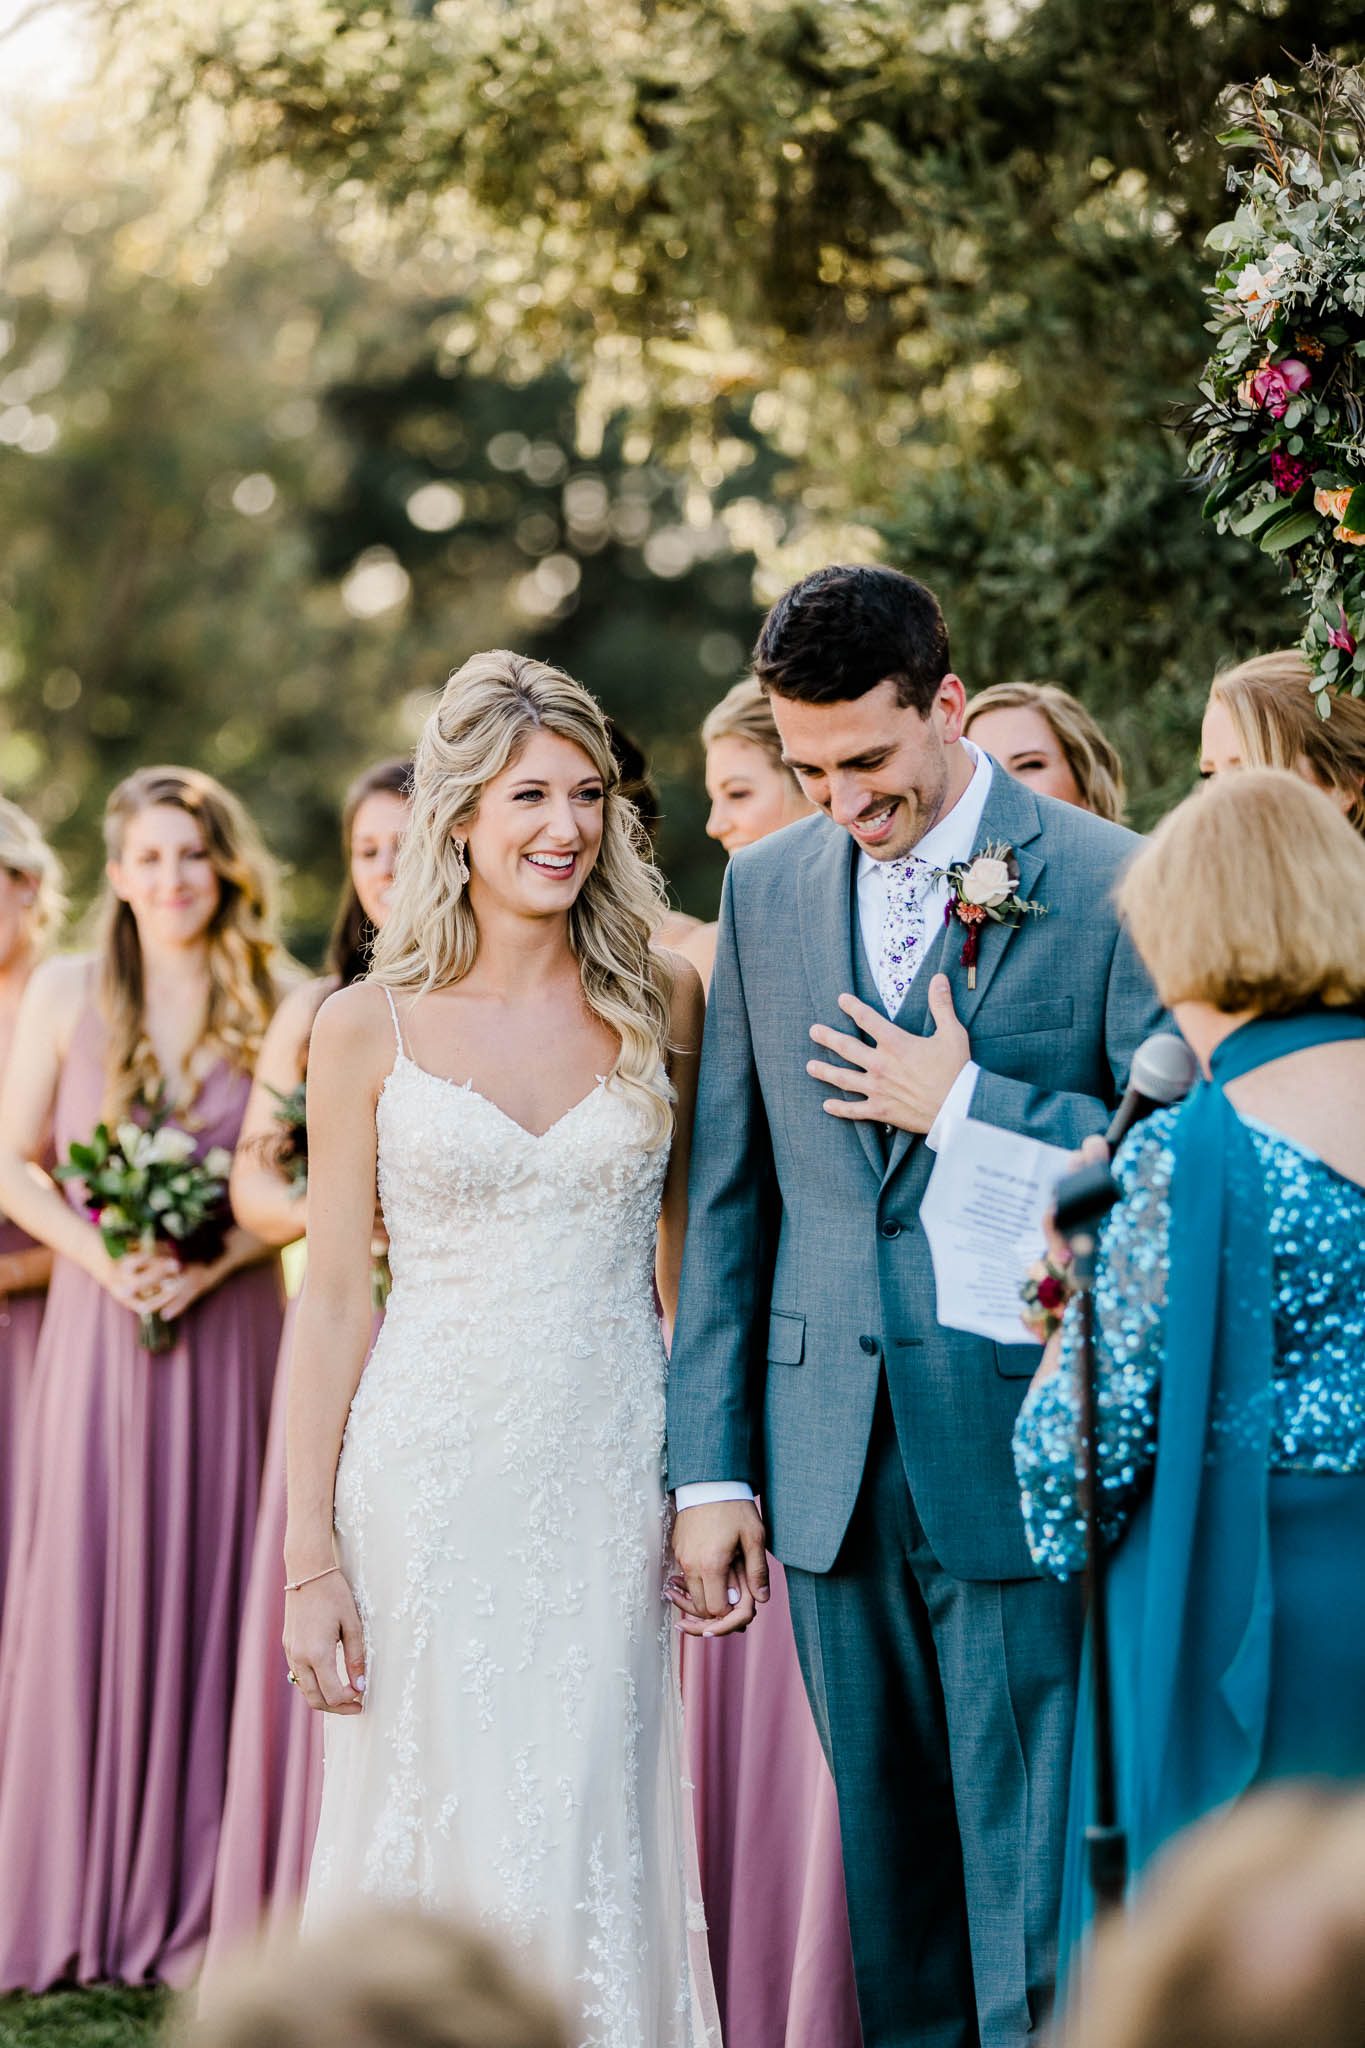 Frosty-Valley-September-Wedding-7945.jpg